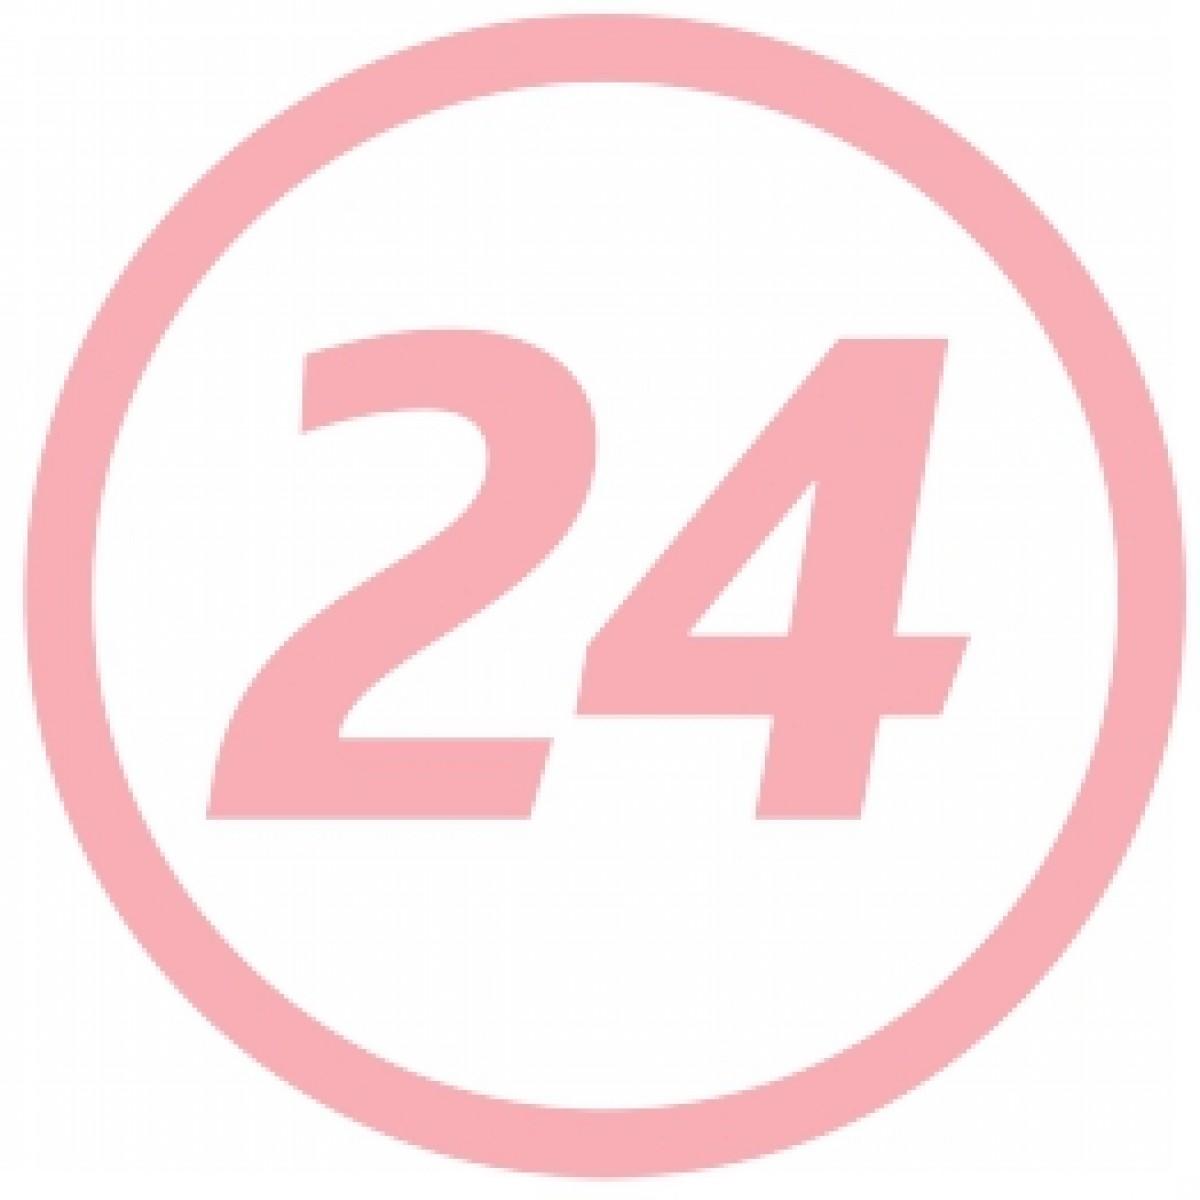 Hartmann Molicare Premium Lady Pad 4.5 Picaturi Tampoane pentru Incontinenta Usoara, Tampoane, 14buc